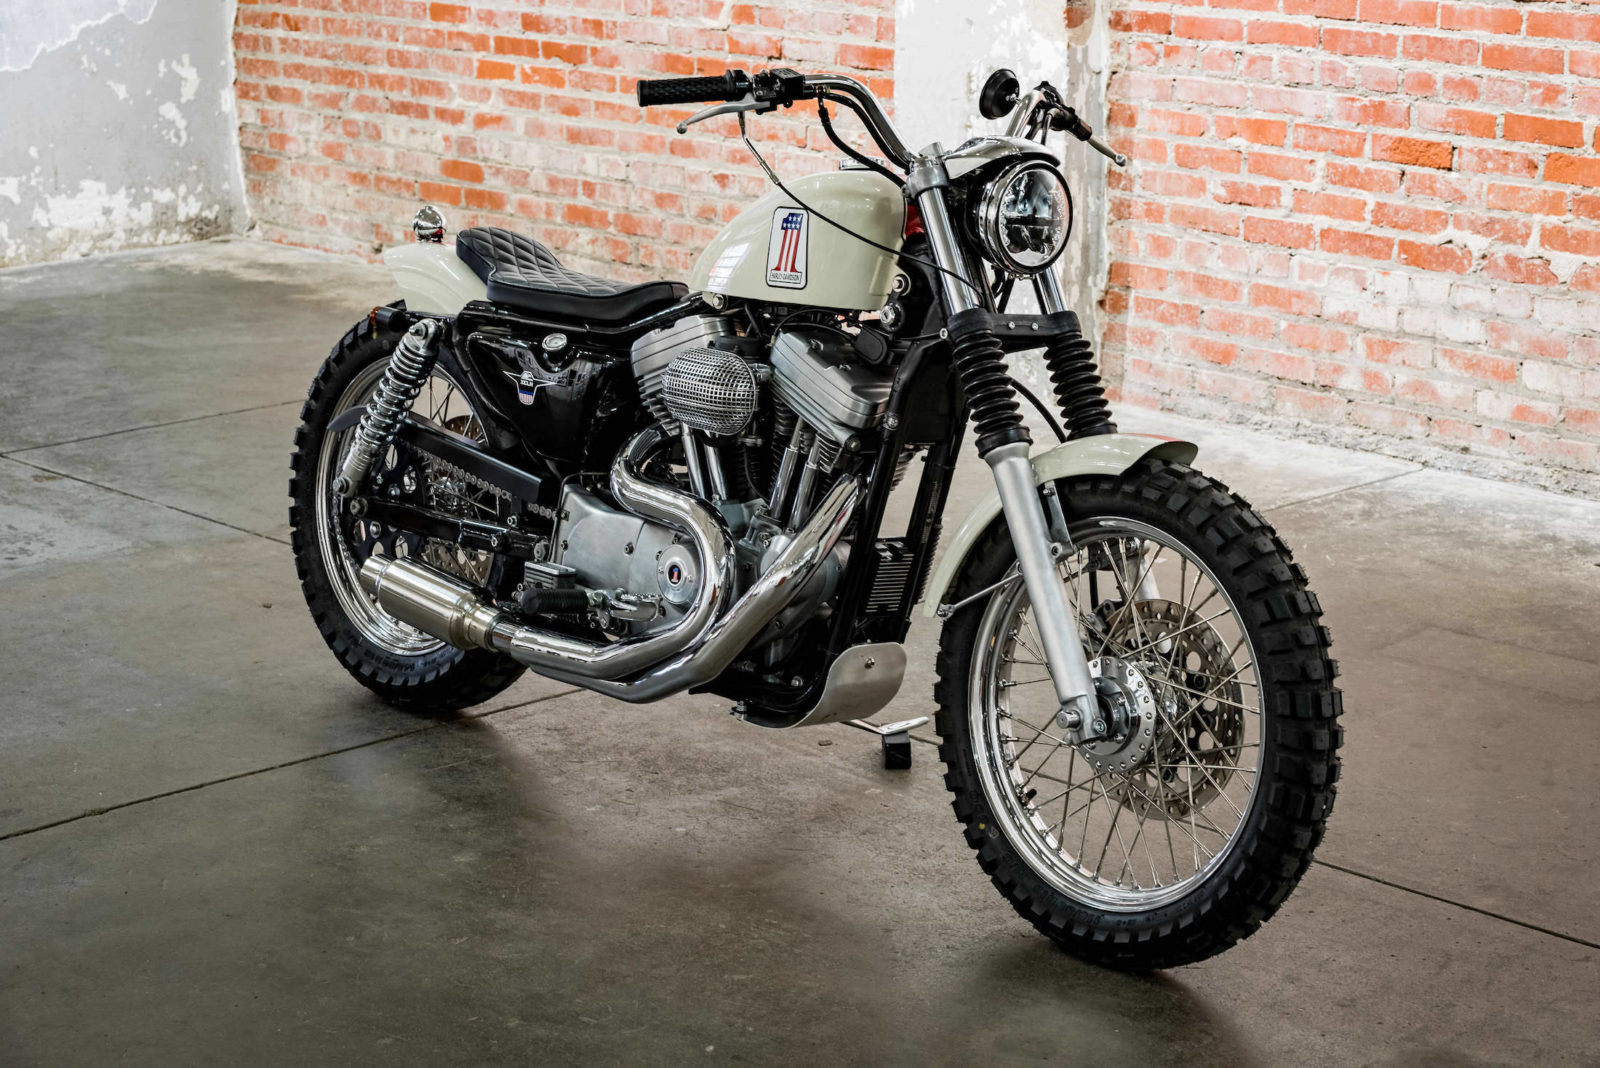 La Harley XL1200 Sportster selon Hageman!